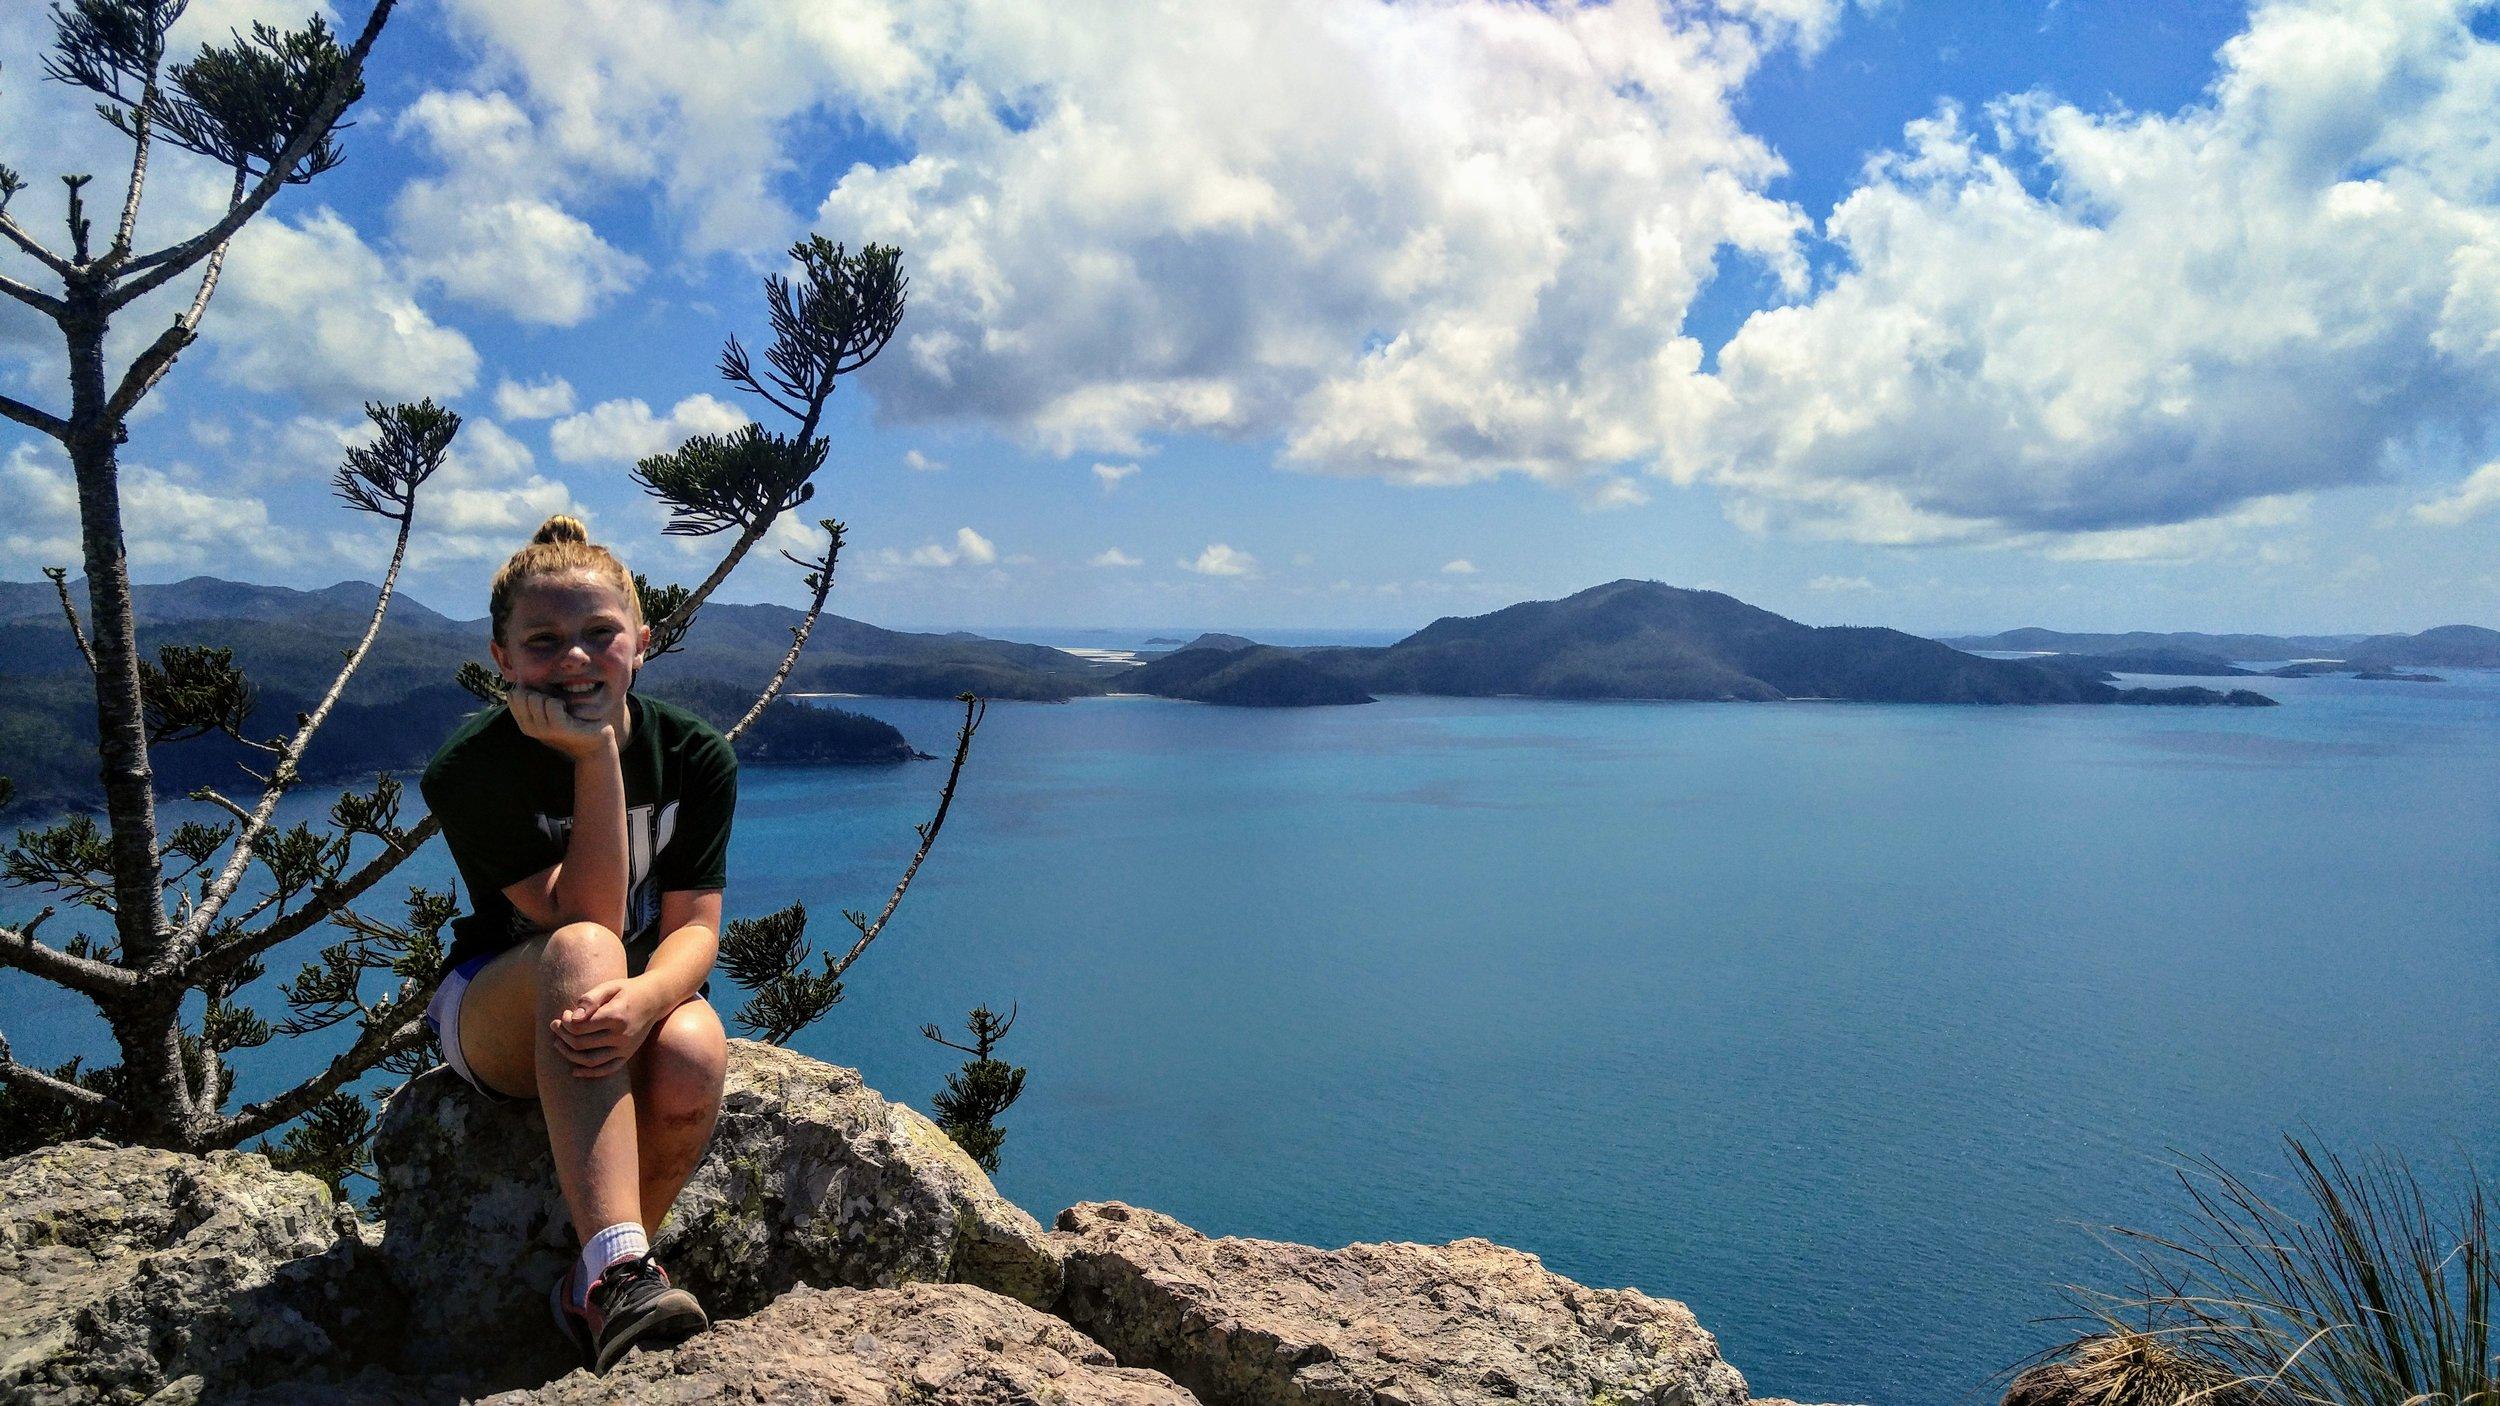 My niece enjoying the view from Passage Peak